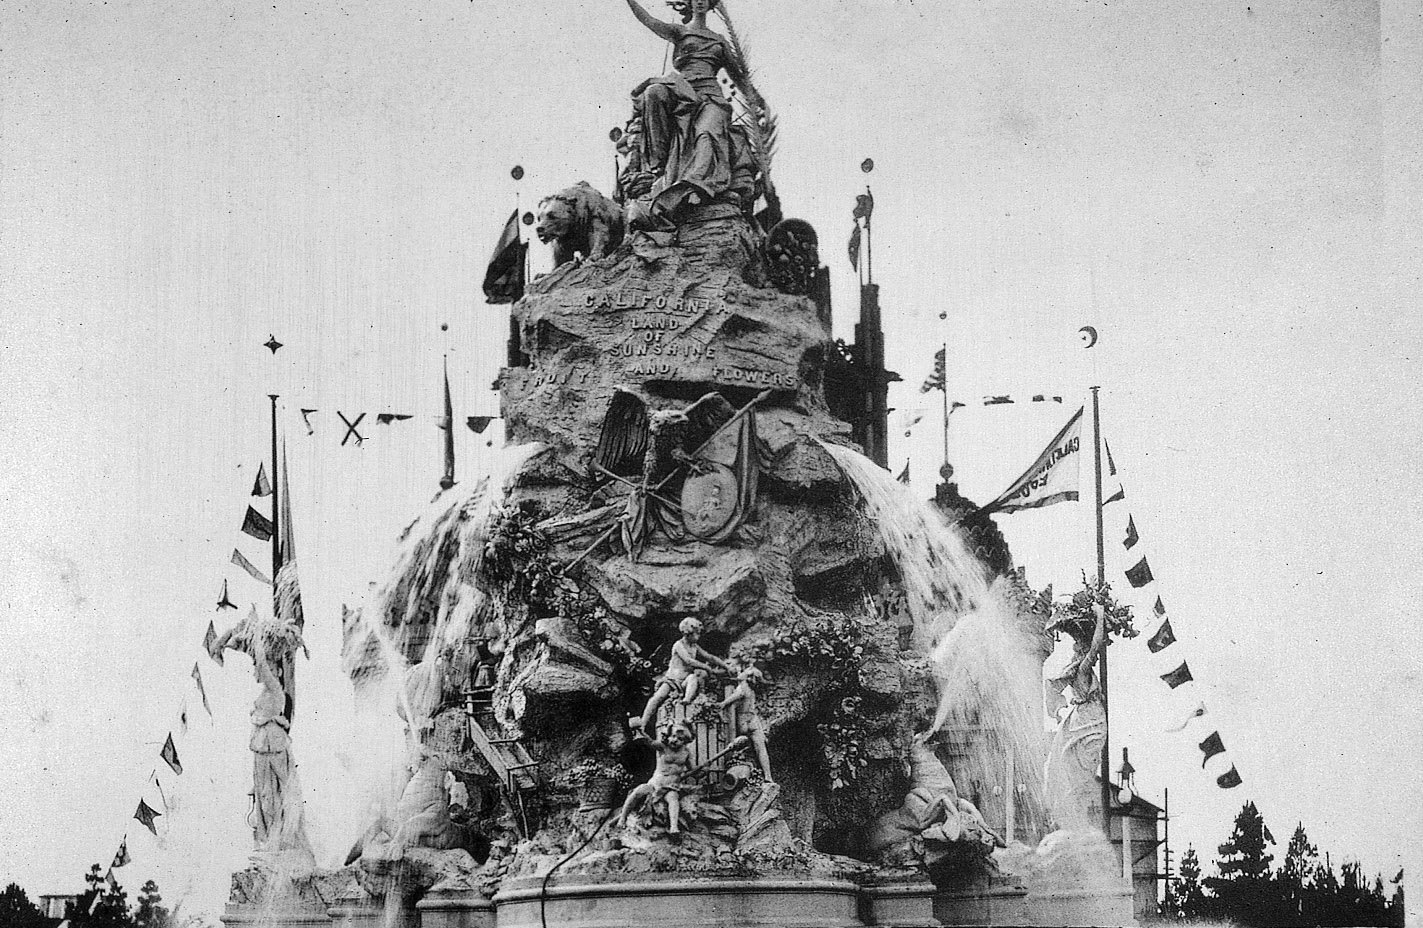 1894 midwestern expo-allegorical fountain-John A Harris.jpg